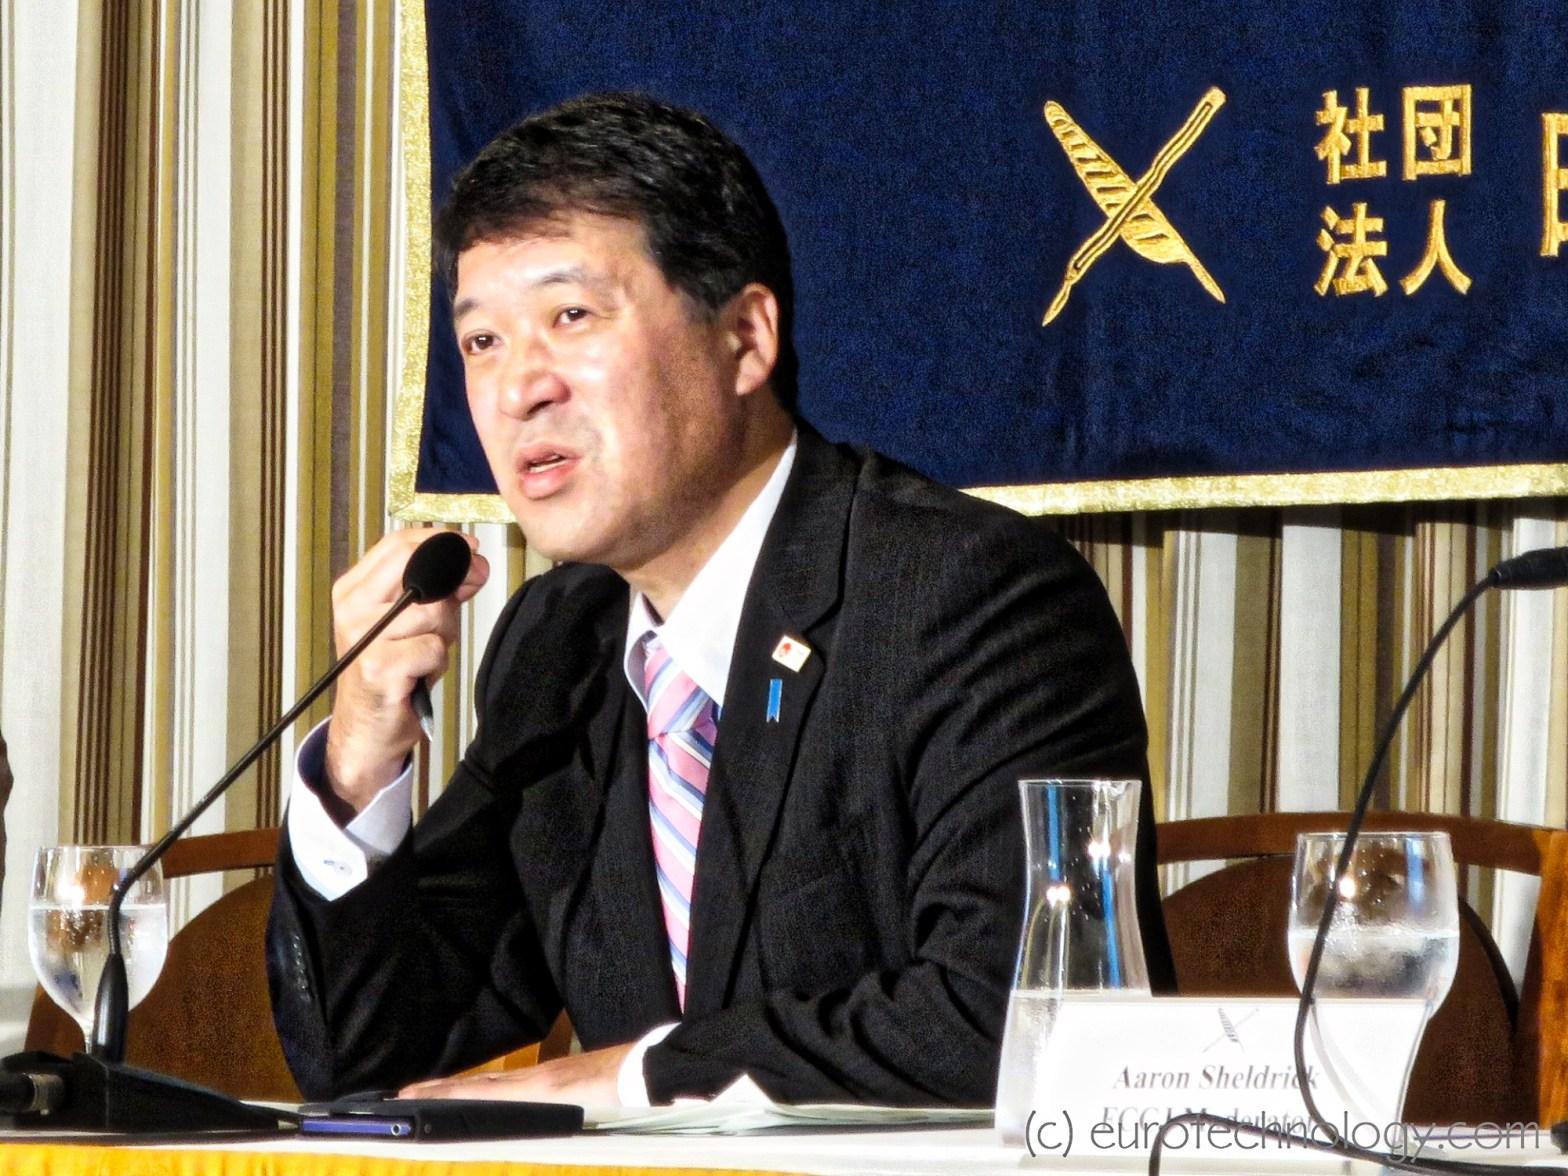 Nuclear safety - Niigata Governor Hirohiko Izumida